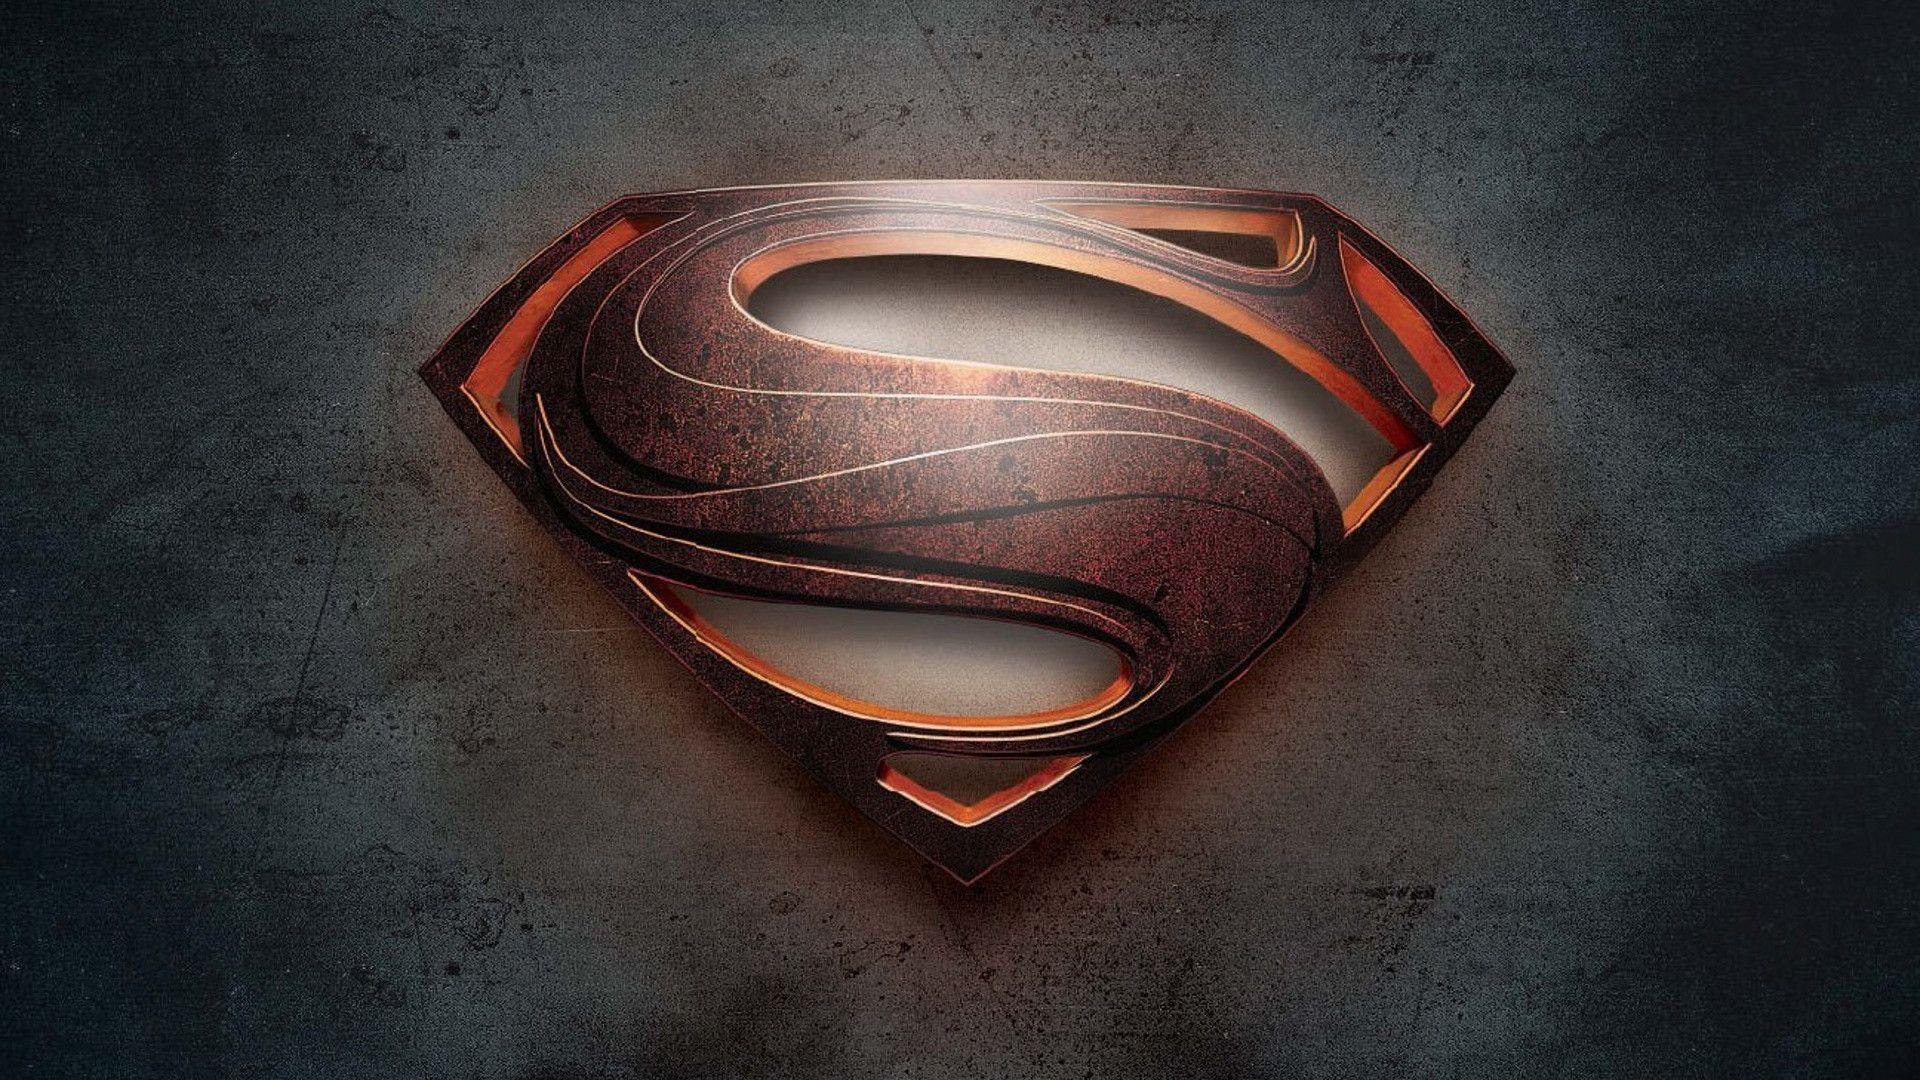 Hd wallpaper superman - Superman Logo Wallpaper Hd Man Of Steel 1080p Genovic